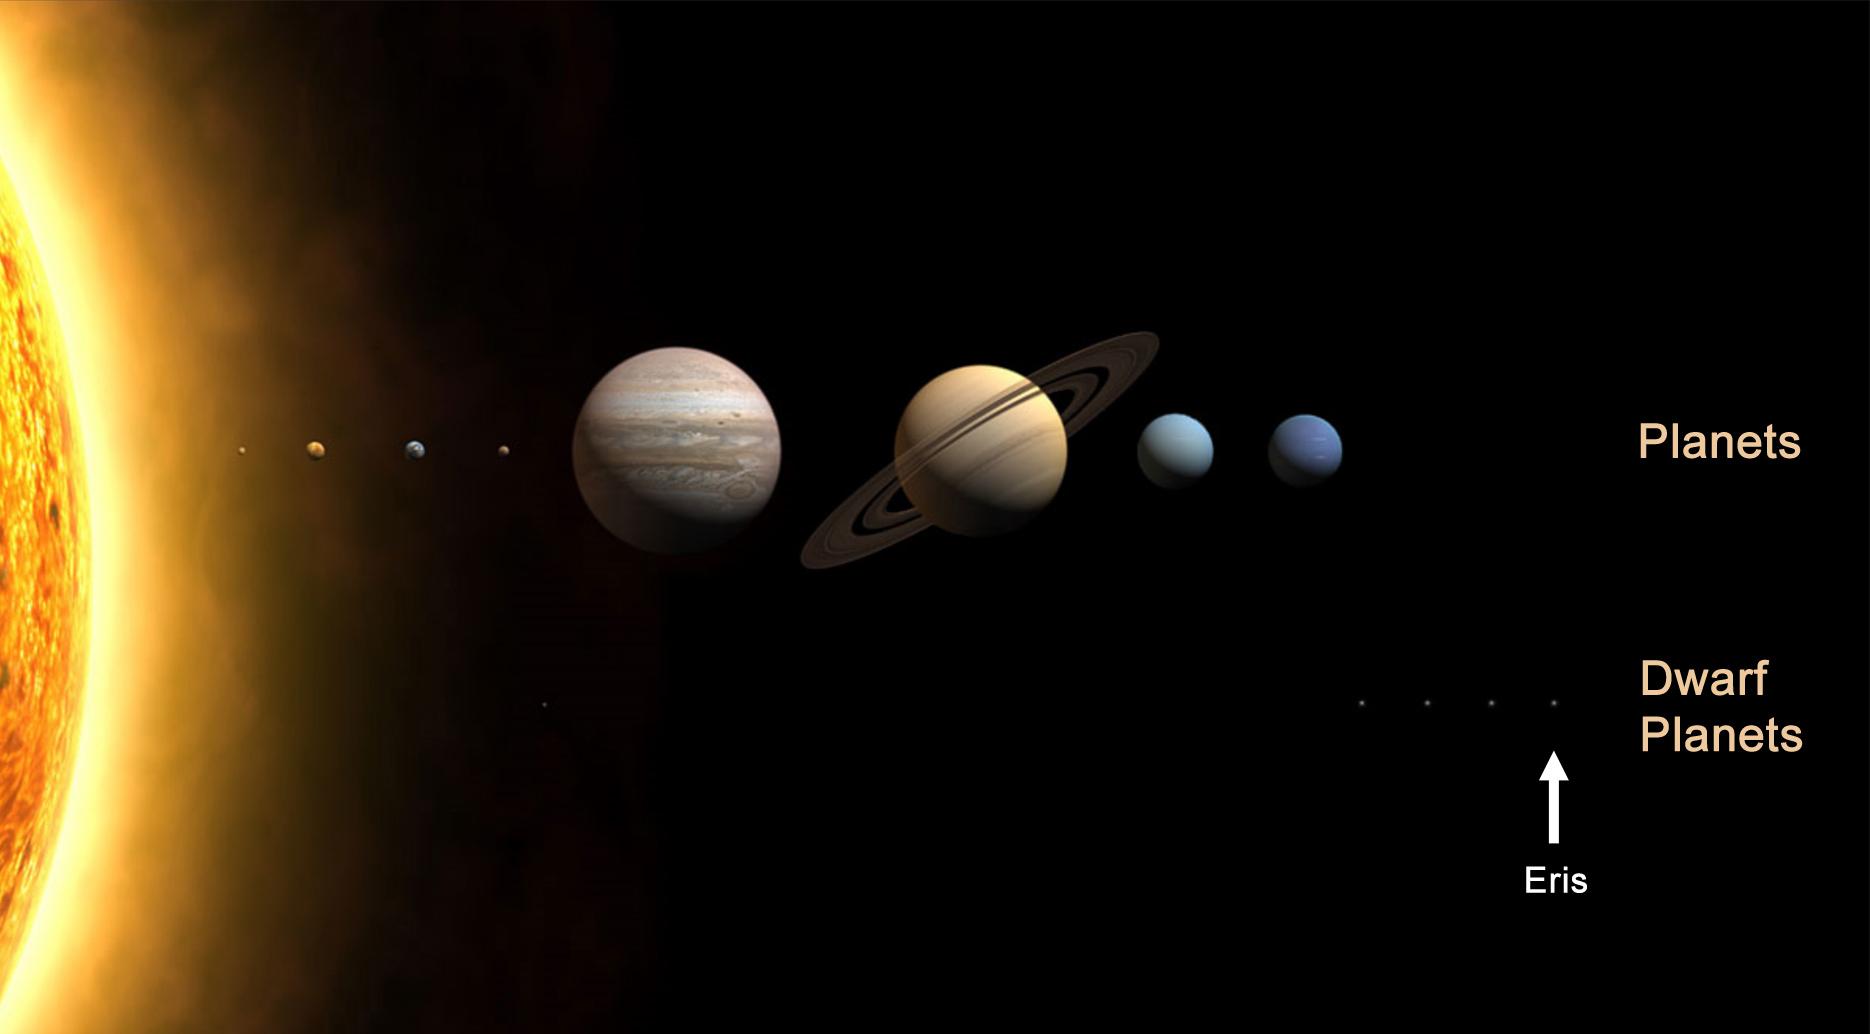 pluto location in solar system - photo #32